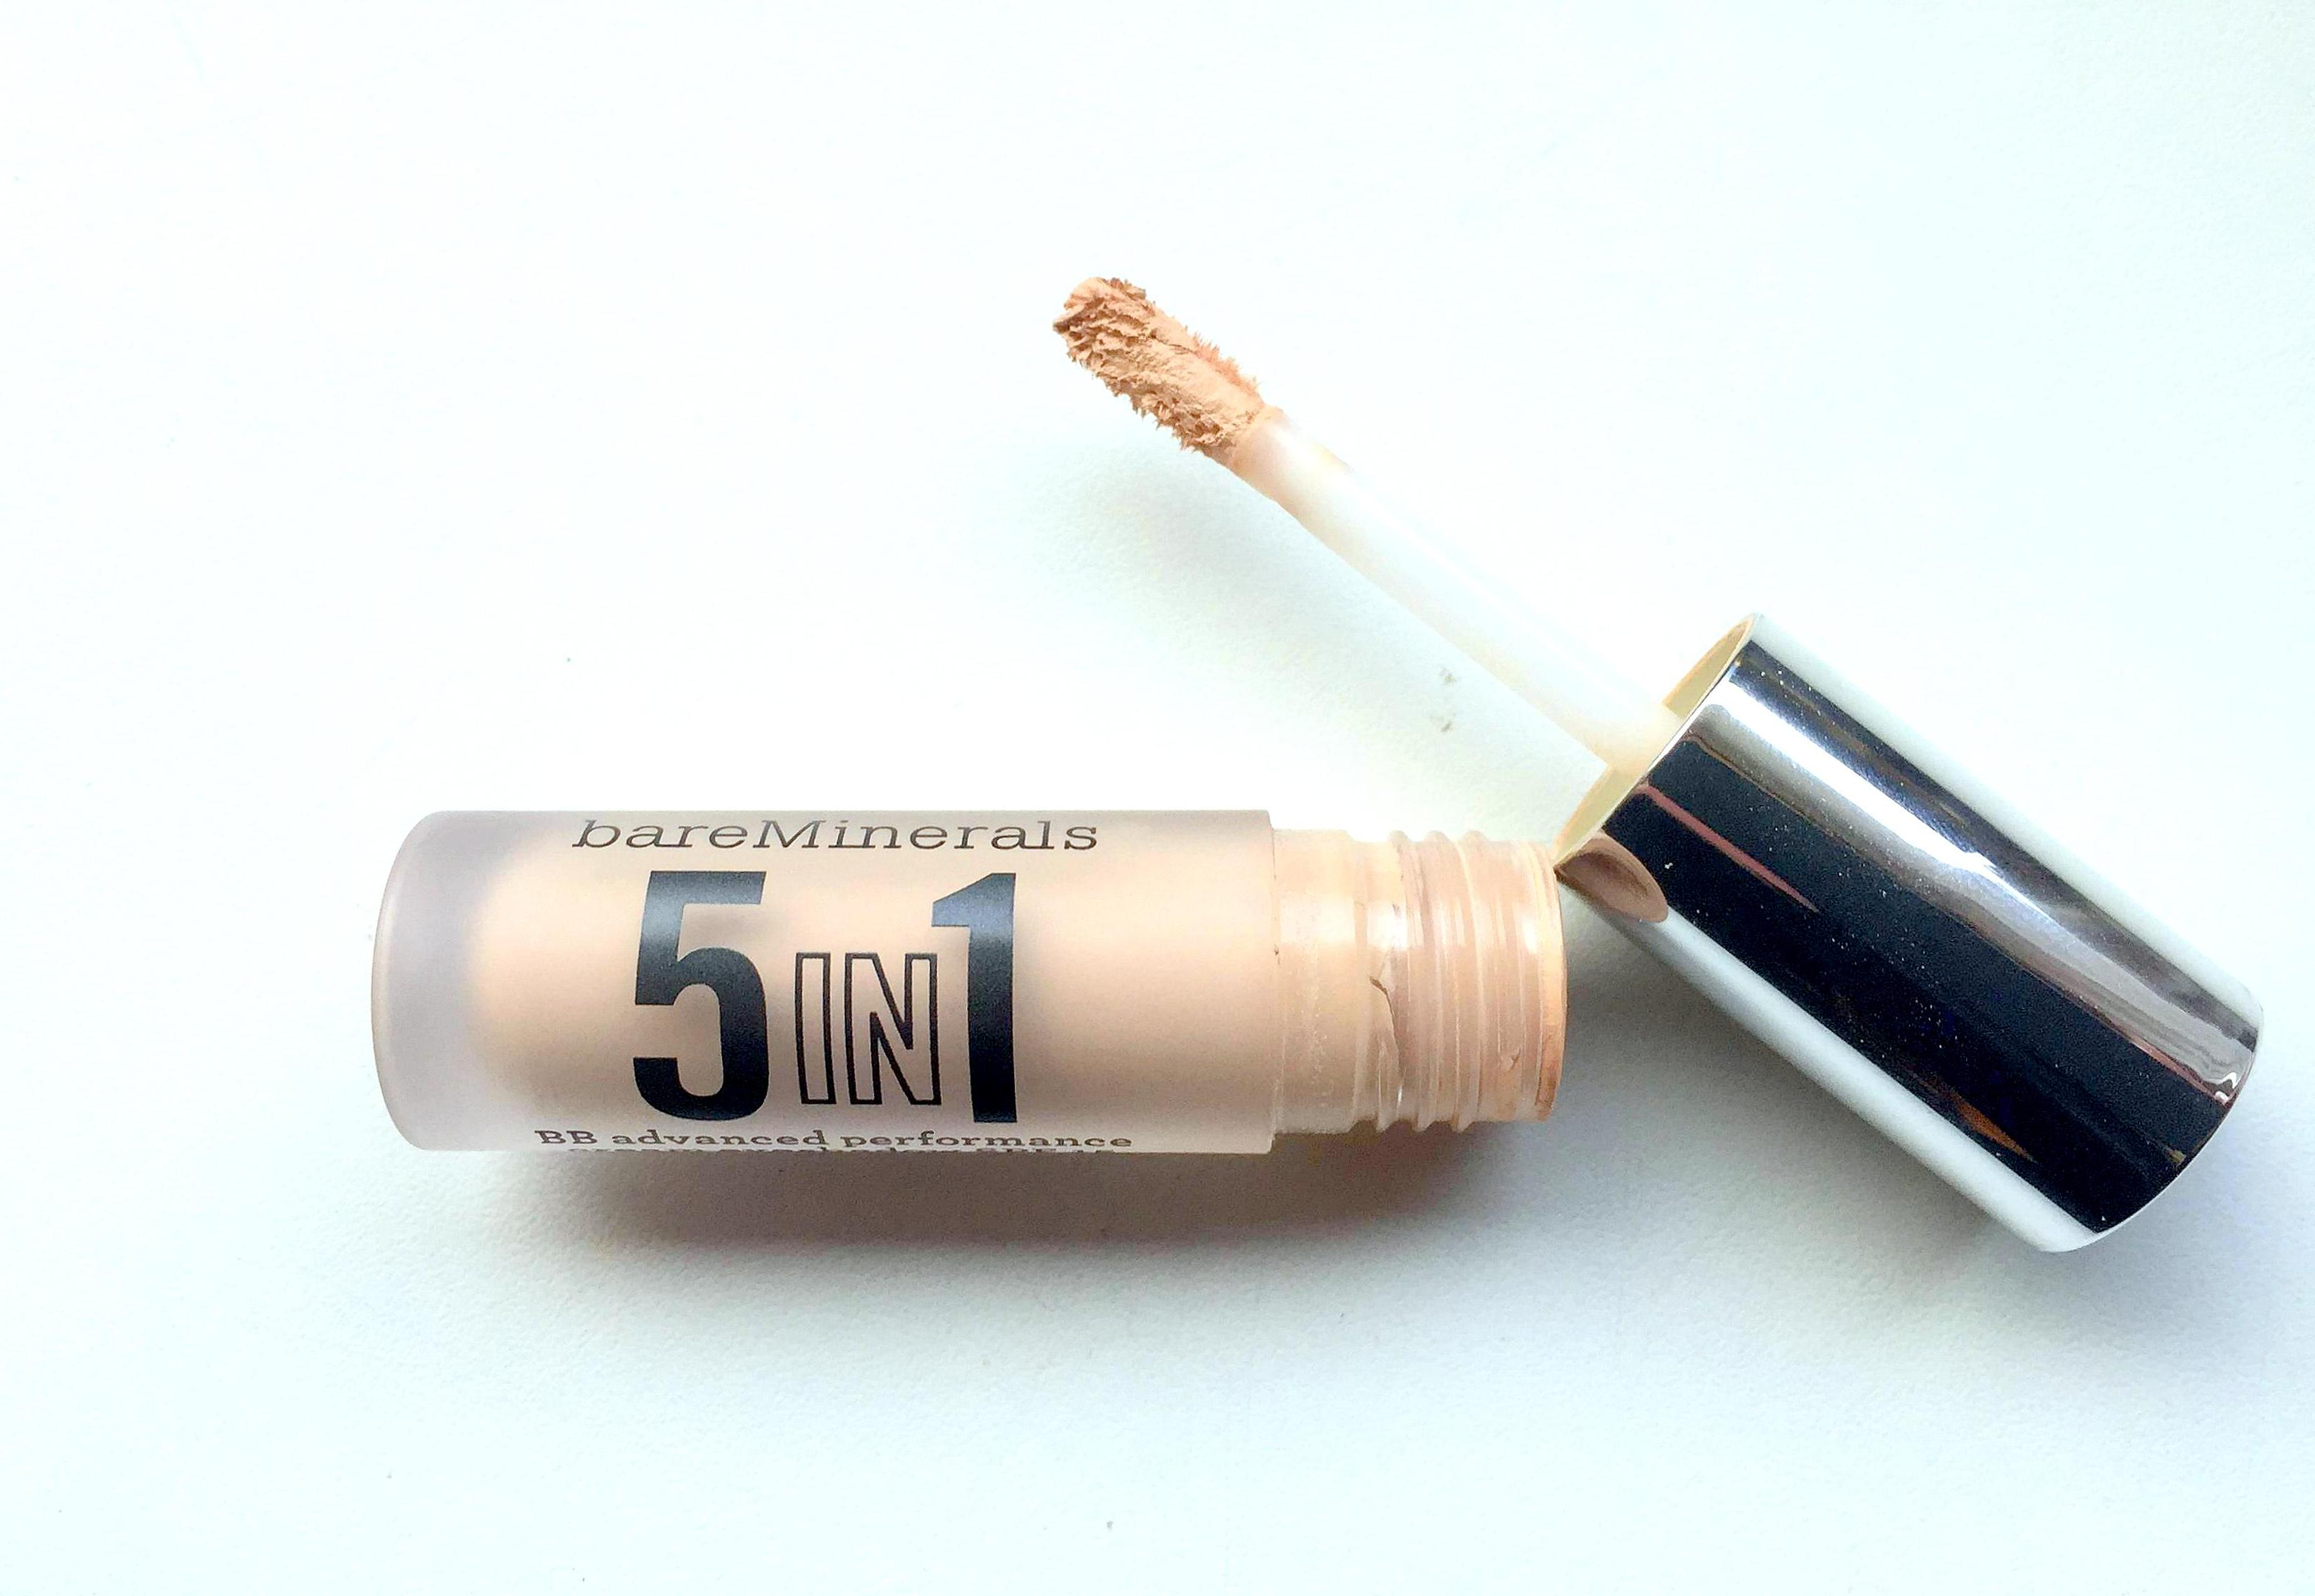 BARE MINERALS 5-in-1 Advanced Performance BB Cream Eyeshadow SPF15